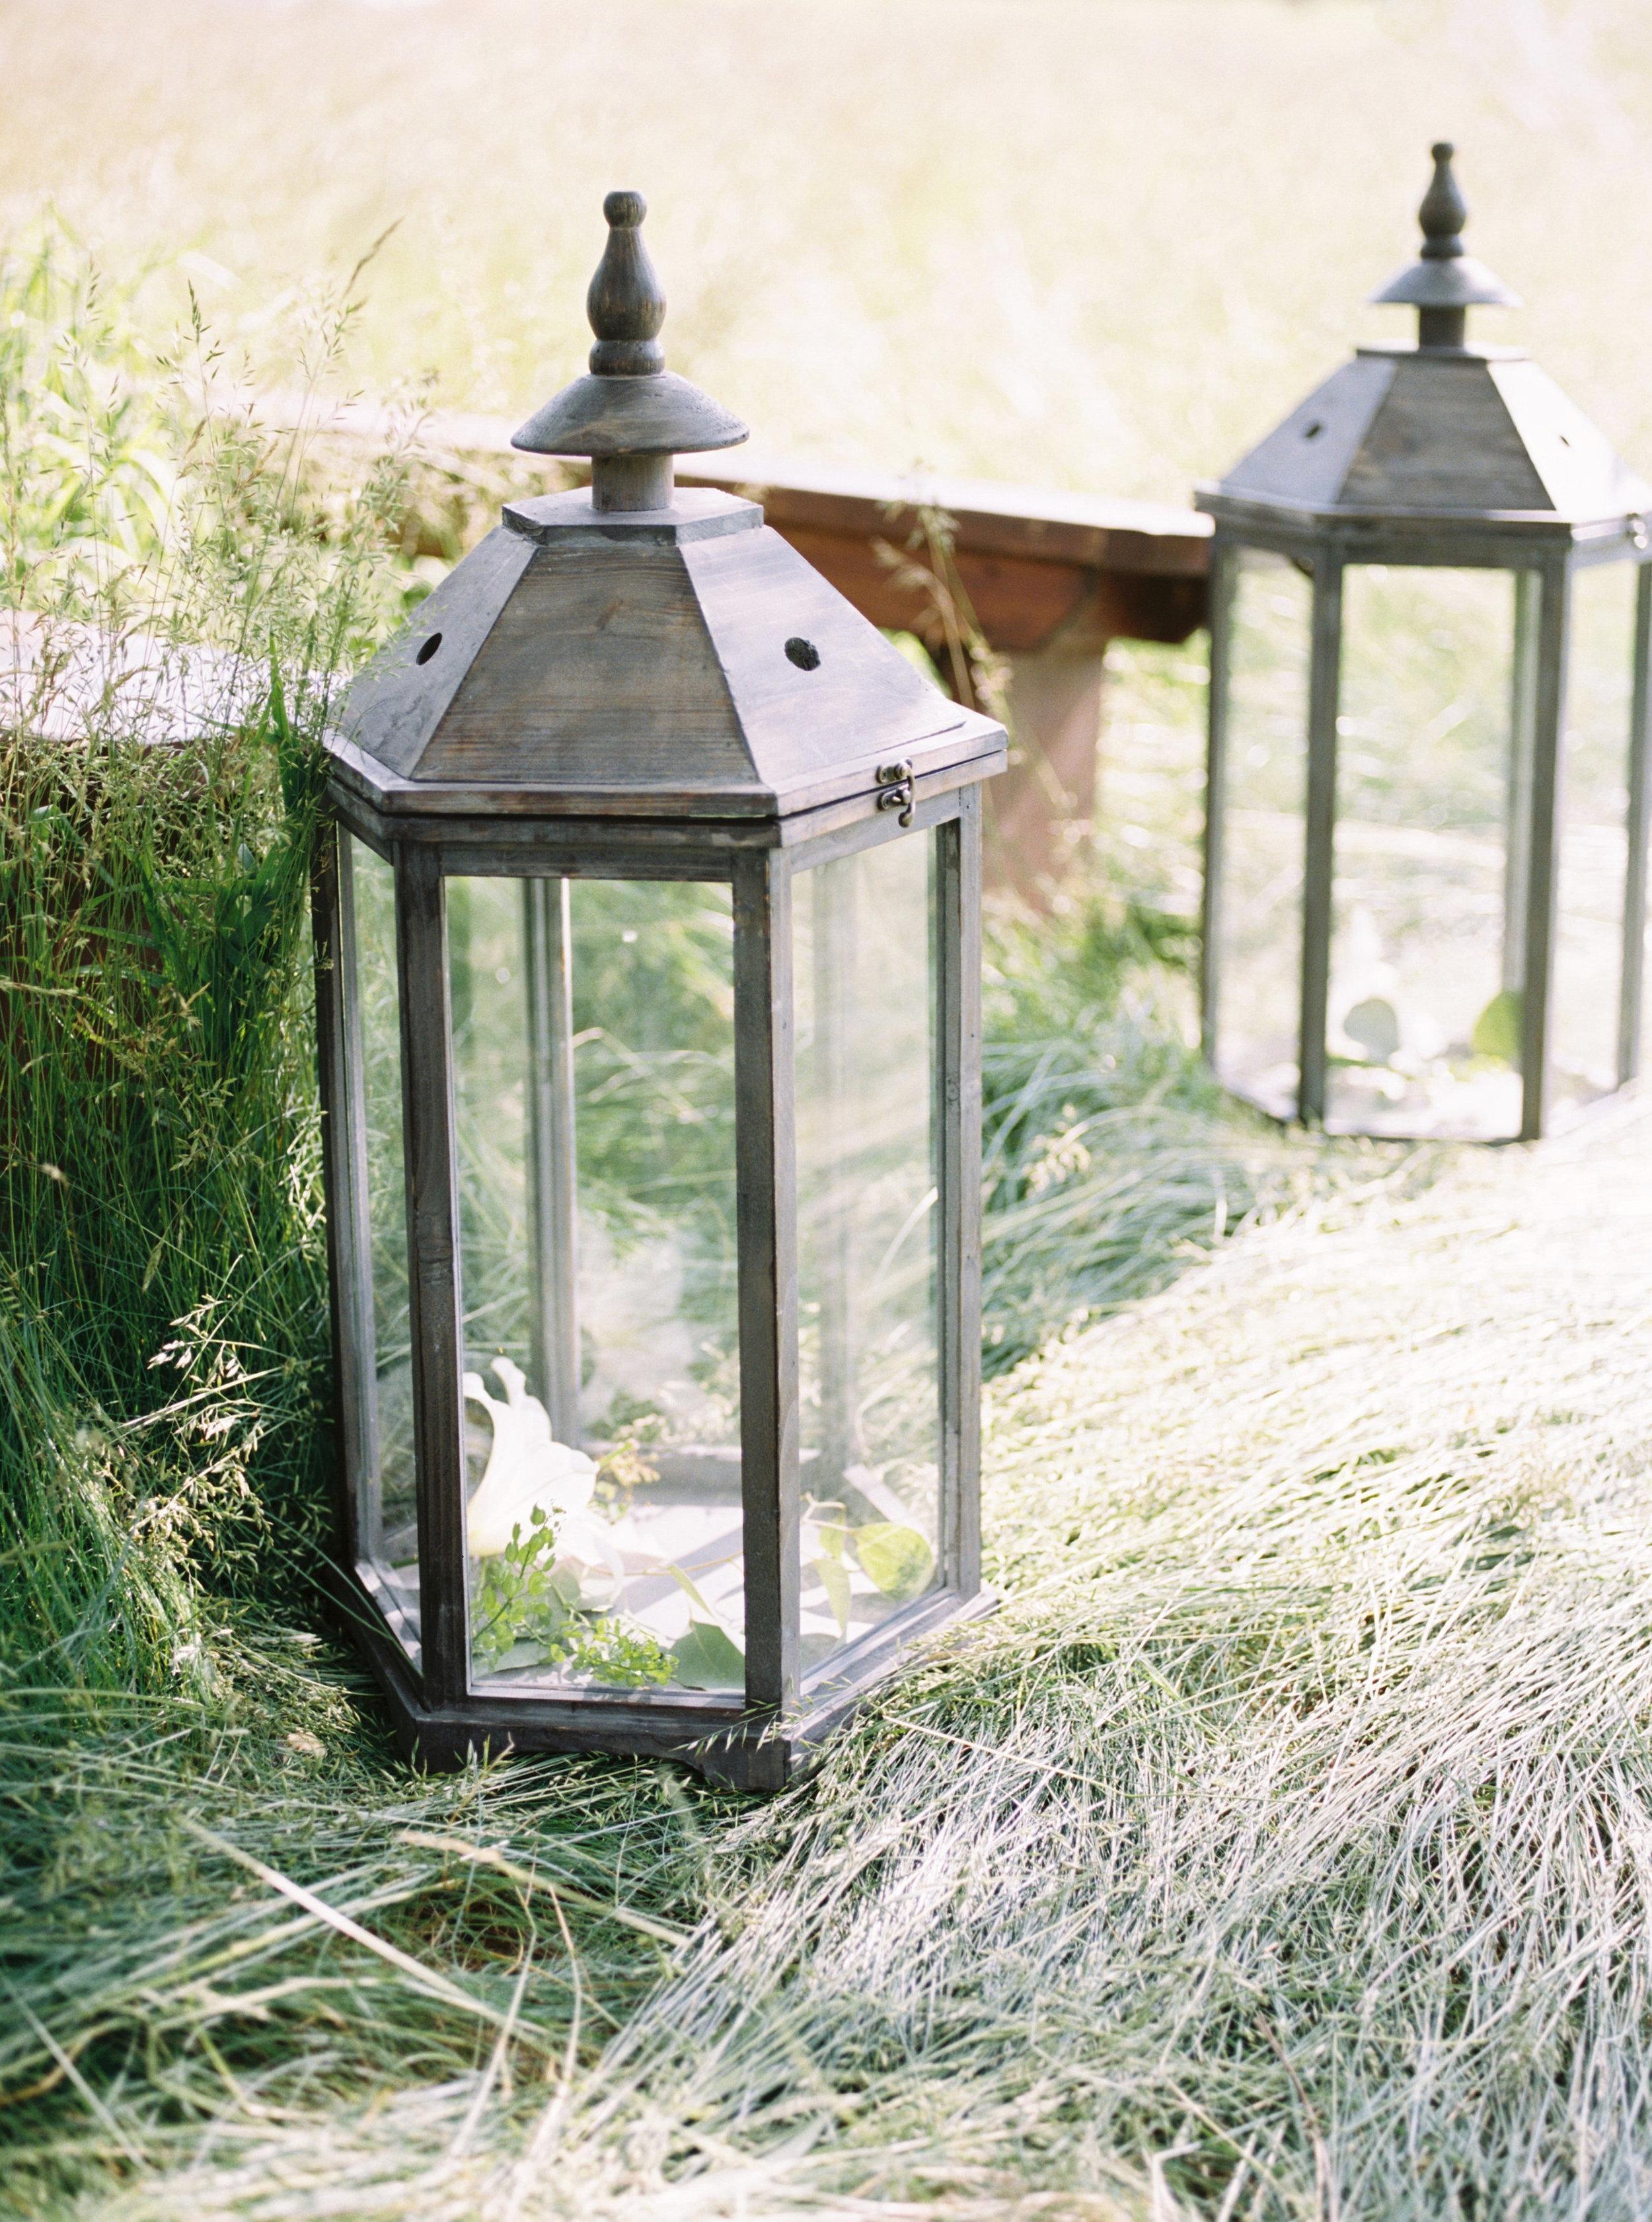 greenhouse-wedding-inspiration-by-laurelyn-savannah-photography-96.jpg